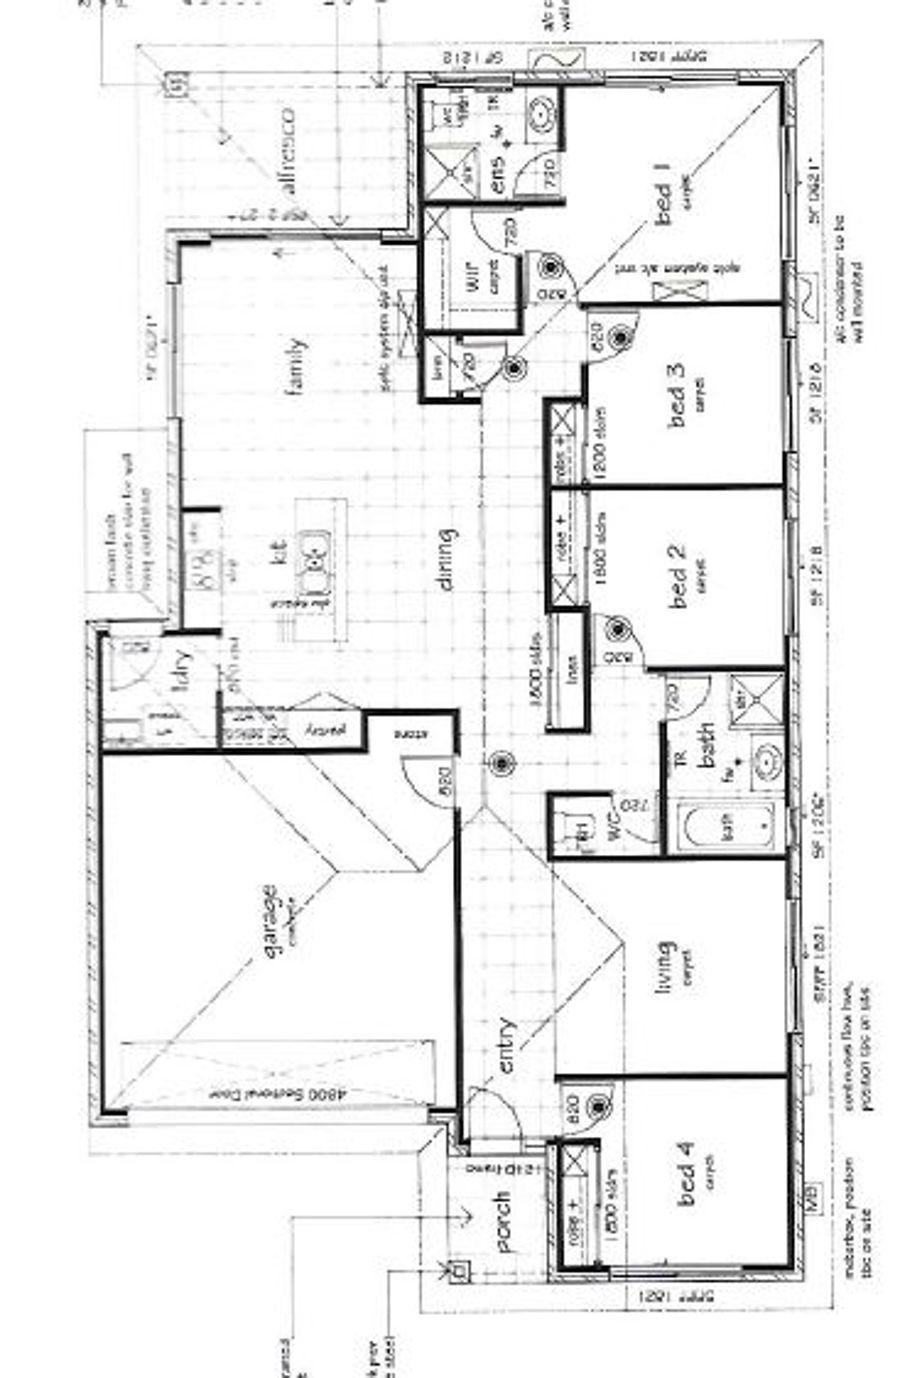 Allresco property report for 13 splendid close, pallara qld 4110